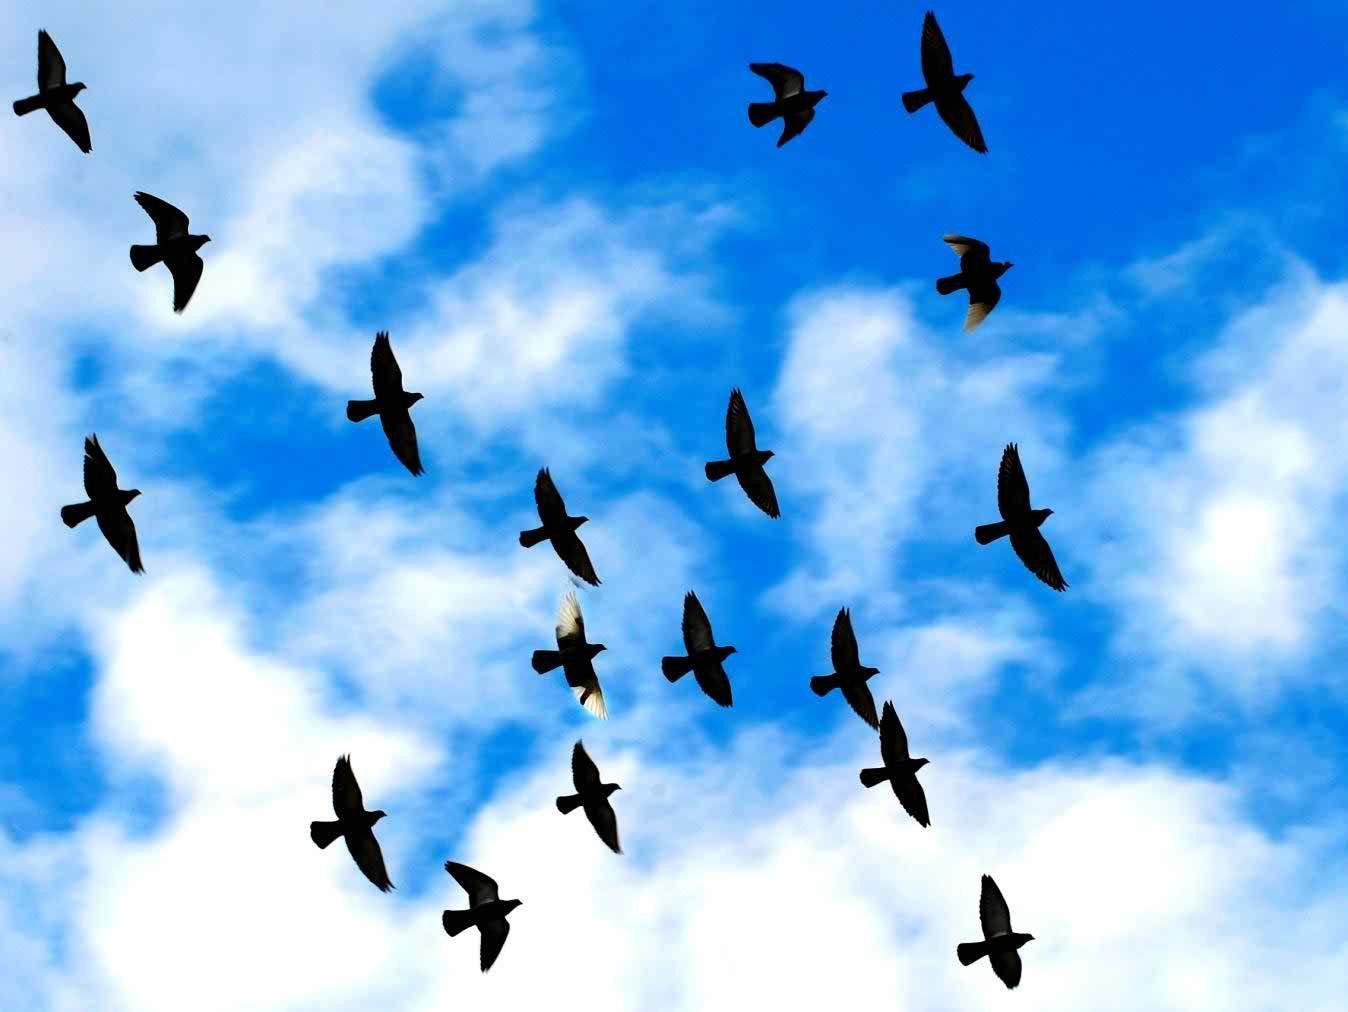 Flying Birds Hd Wallpapers For Desktop Hd Wallpapers Pop Birds Flying Birds Birds In The Sky